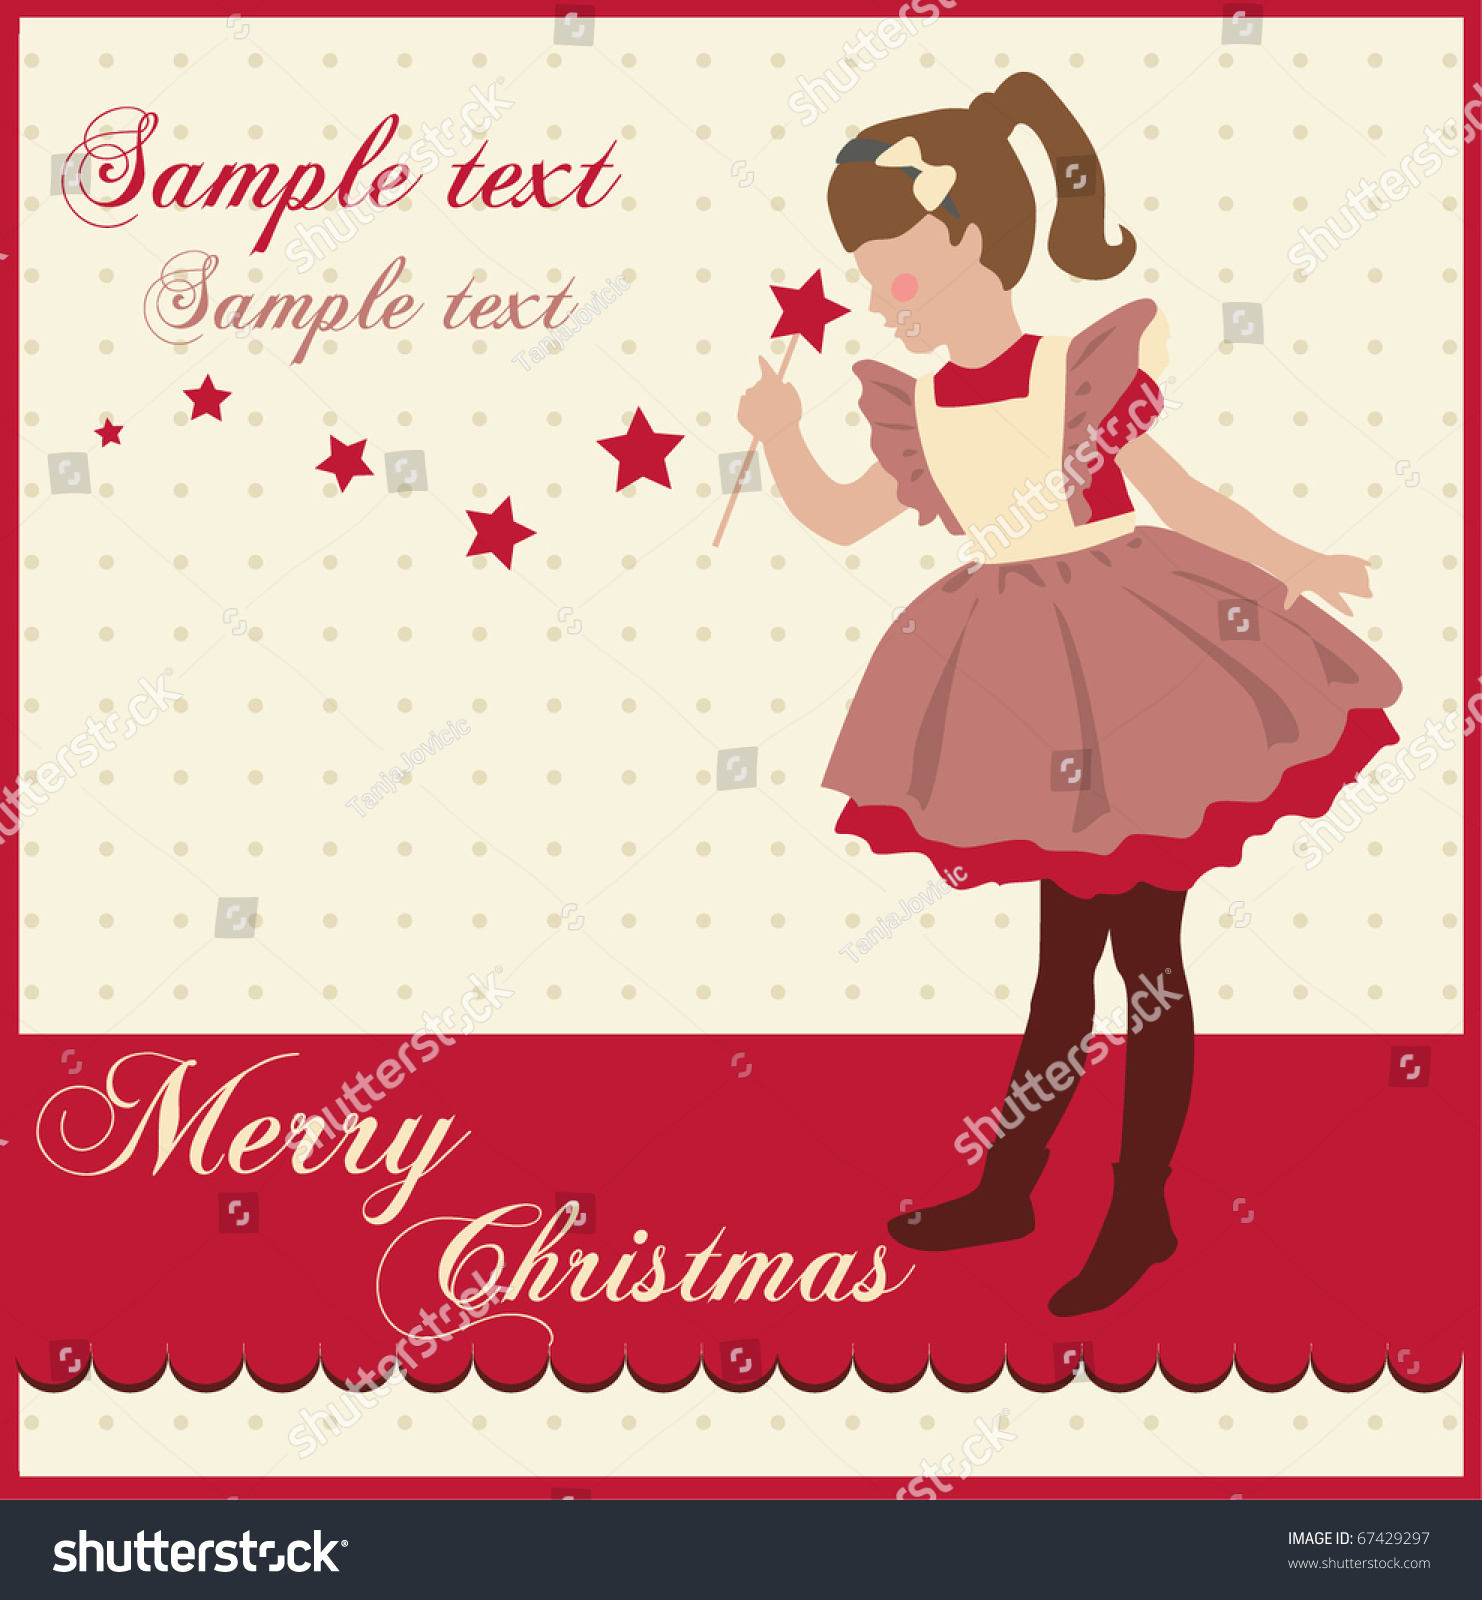 Online Image Amp Photo Editor Shutterstock Editor